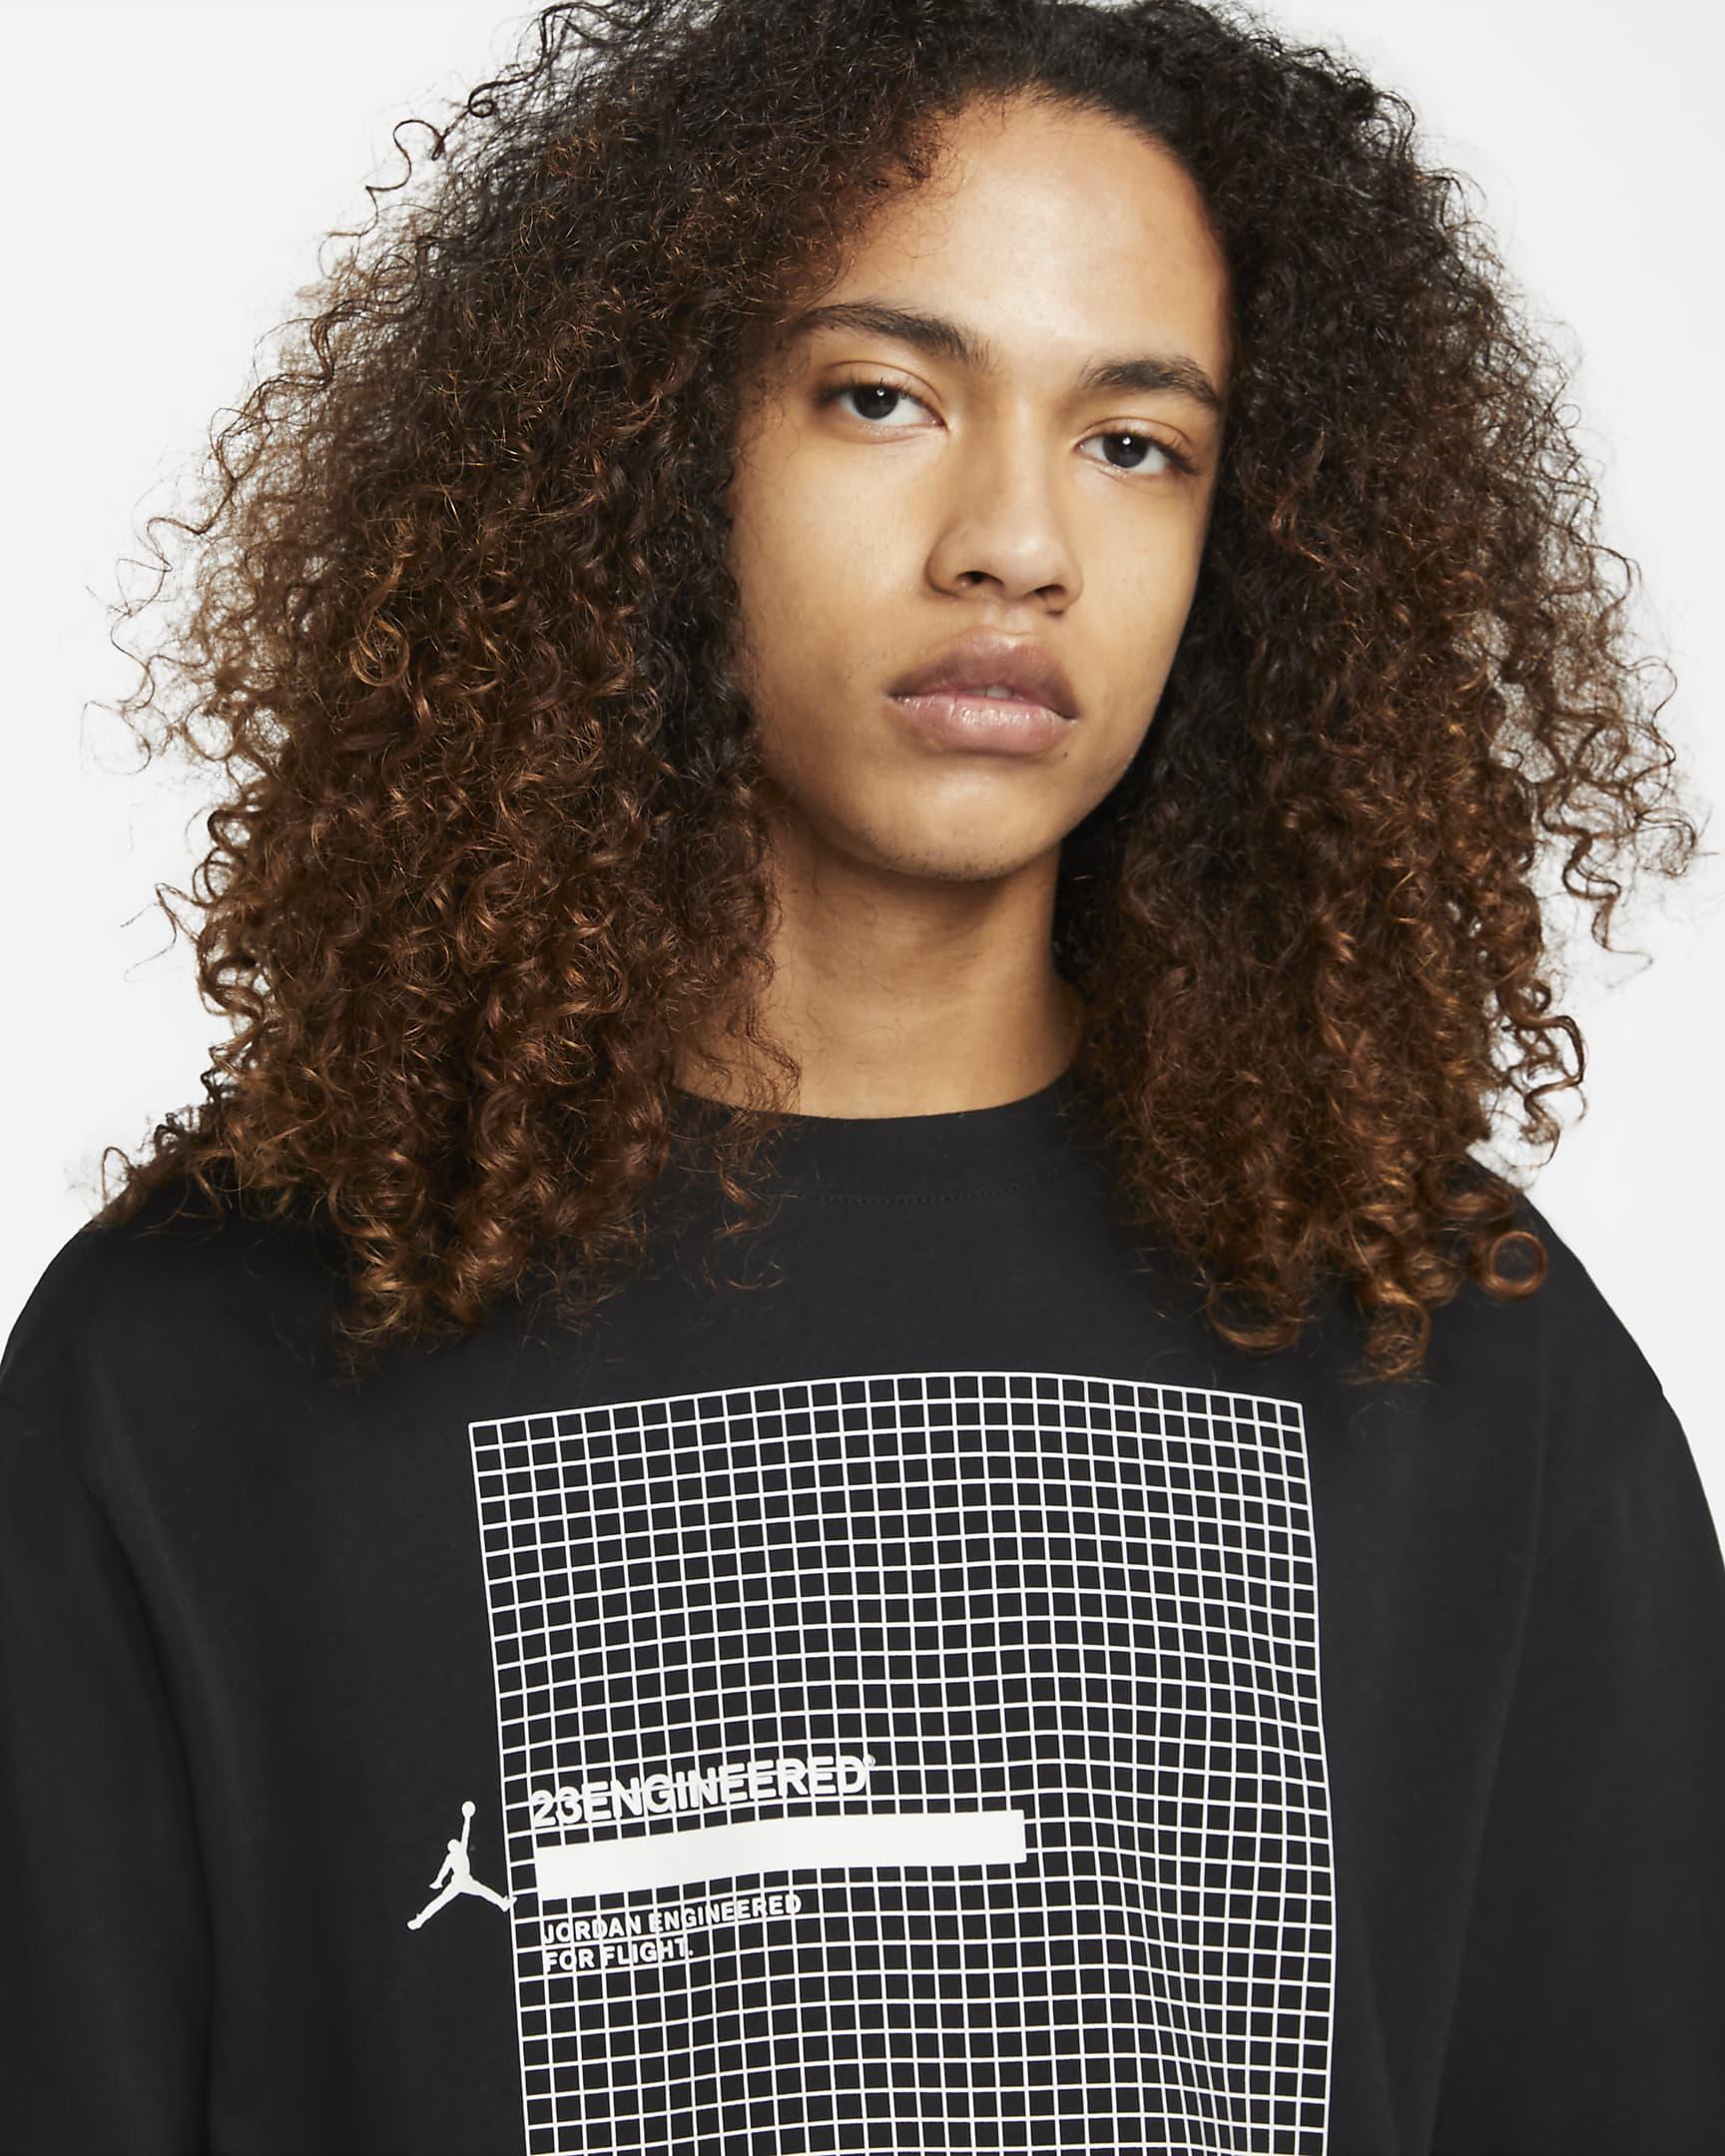 jordan-23-engineered-mens-short-sleeve-t-shirt-WwjbT9-1.png